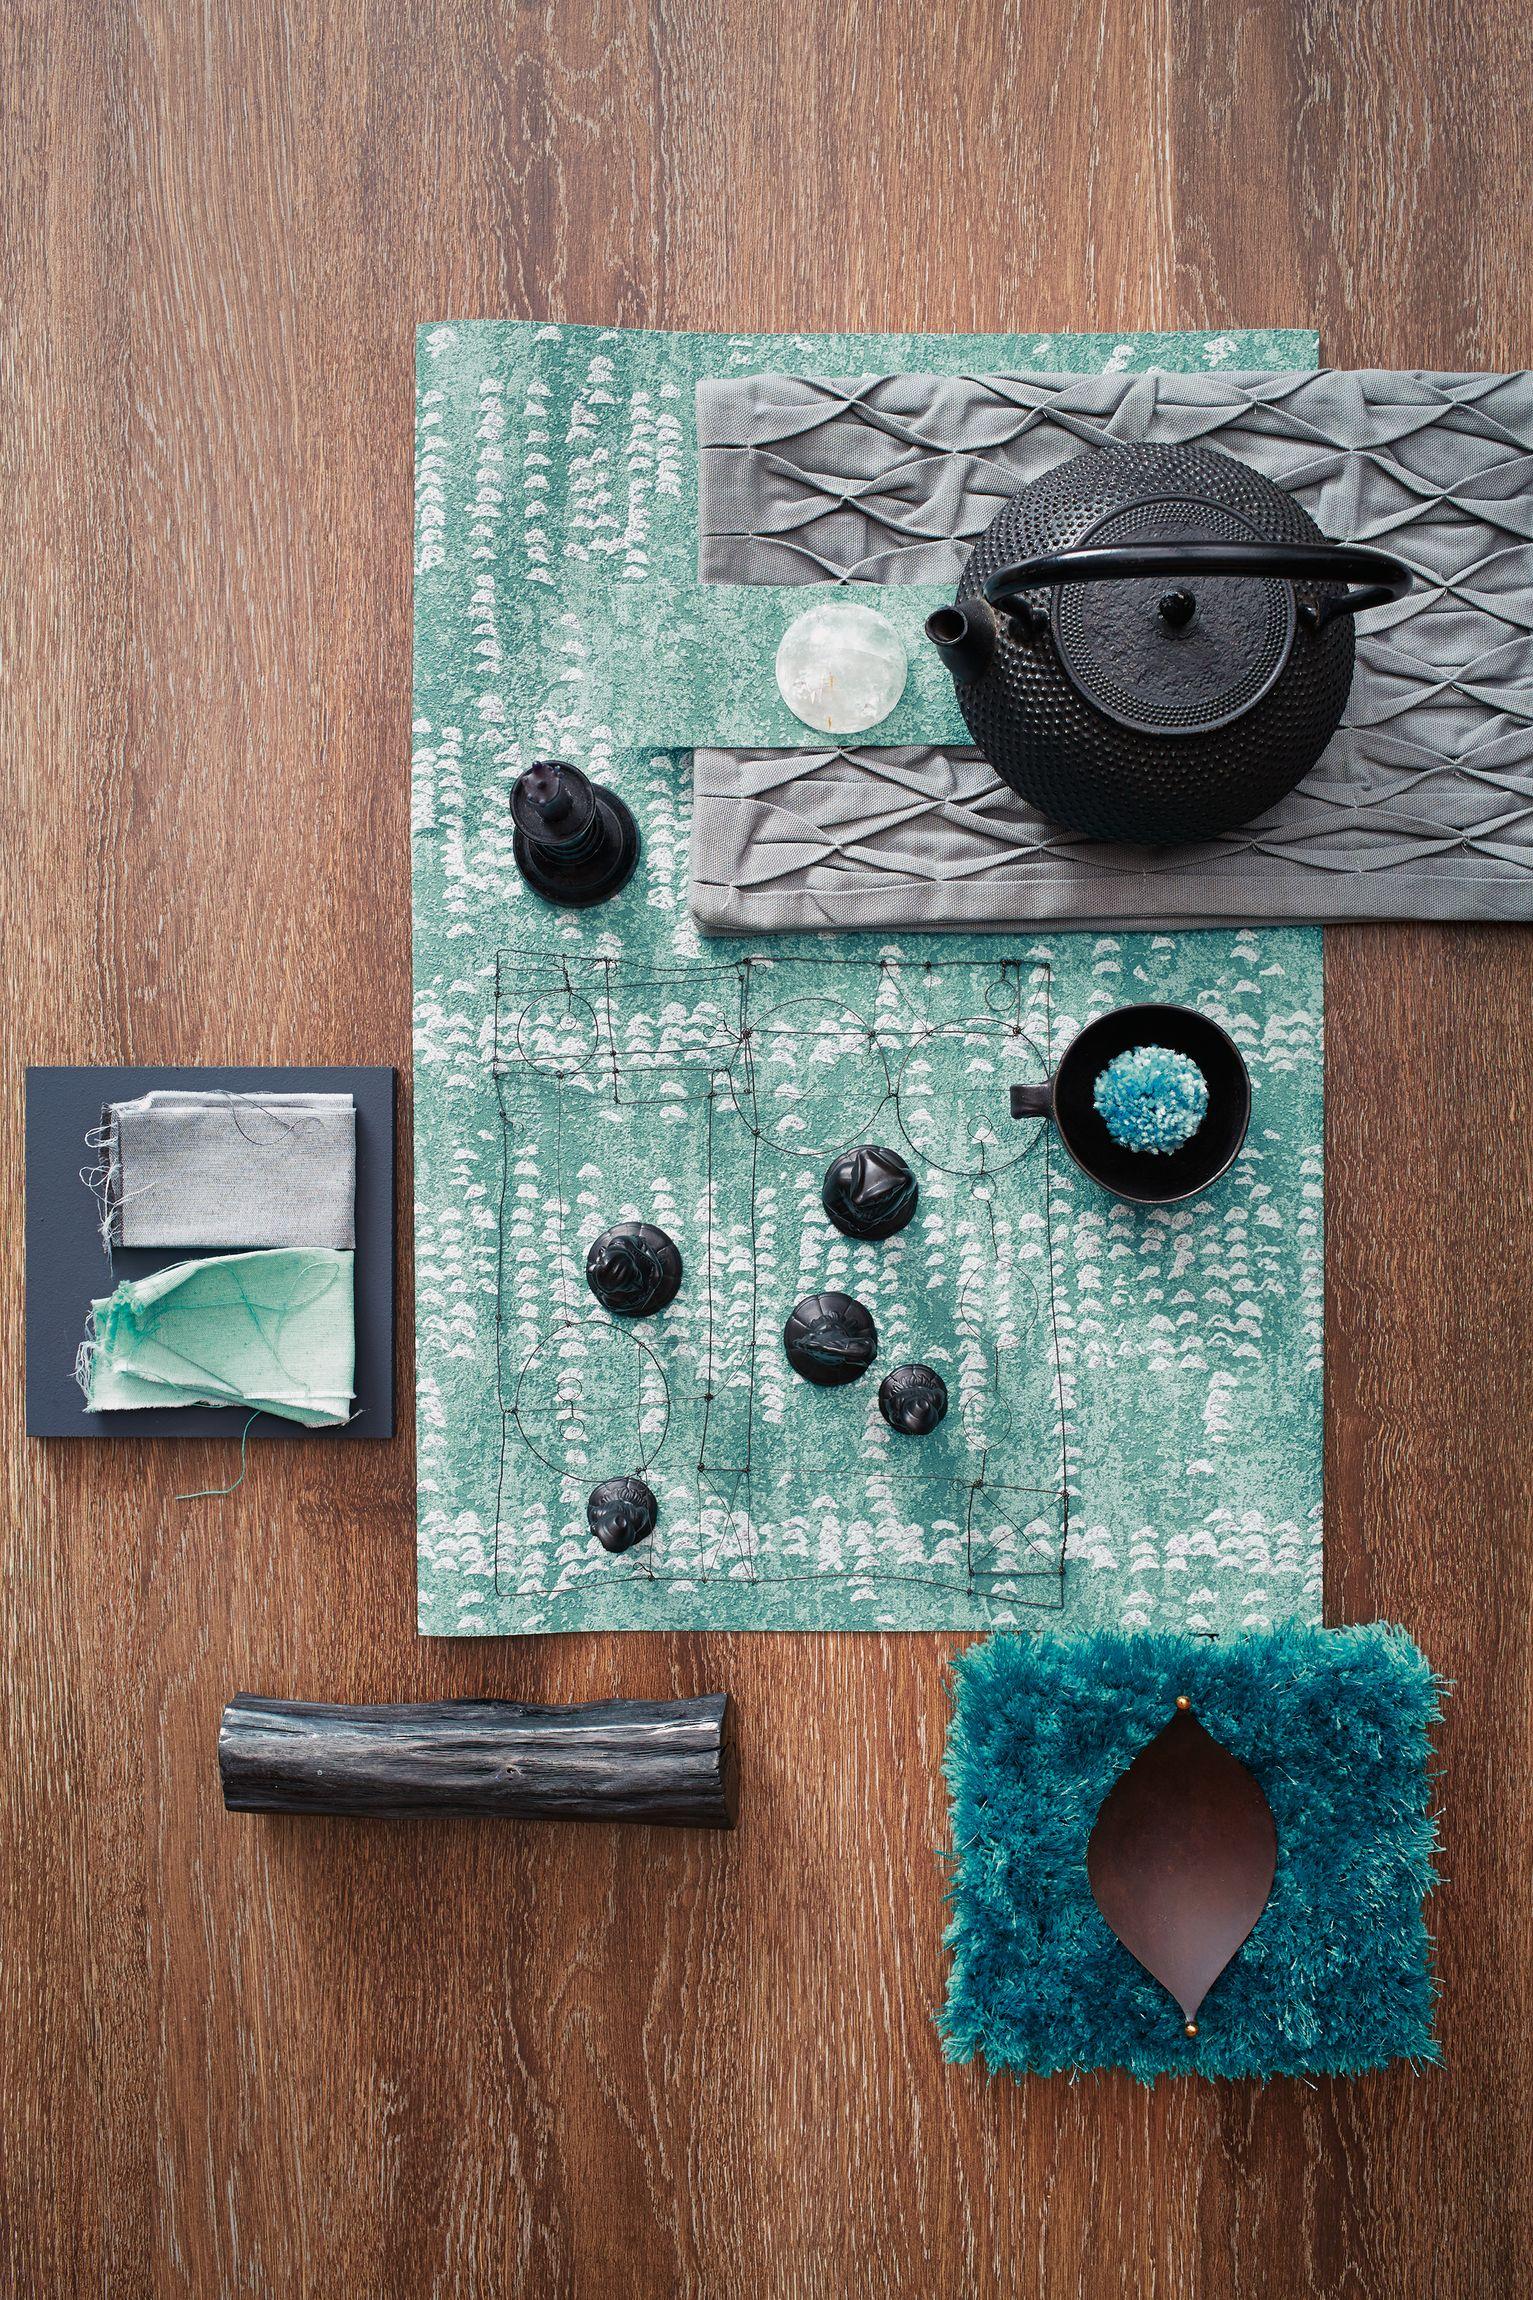 sch ner wohnen tapete avantgarde blau gr n kollektion 7. Black Bedroom Furniture Sets. Home Design Ideas